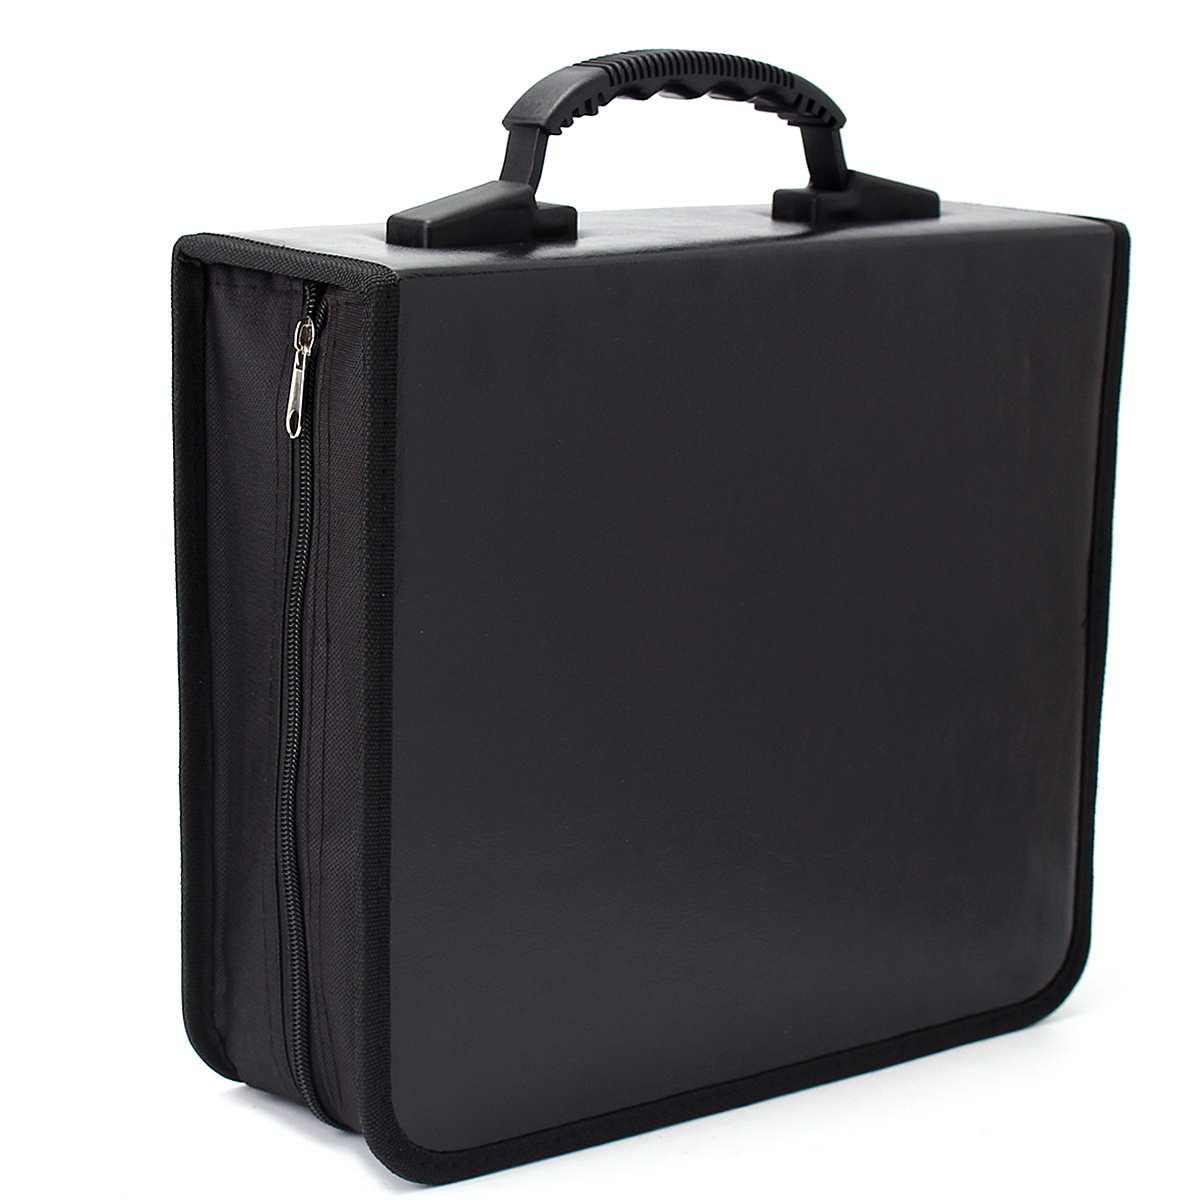 Media Storage Box CD VCD Disc Case Rack Organizer Protection Holder For 330 CDs